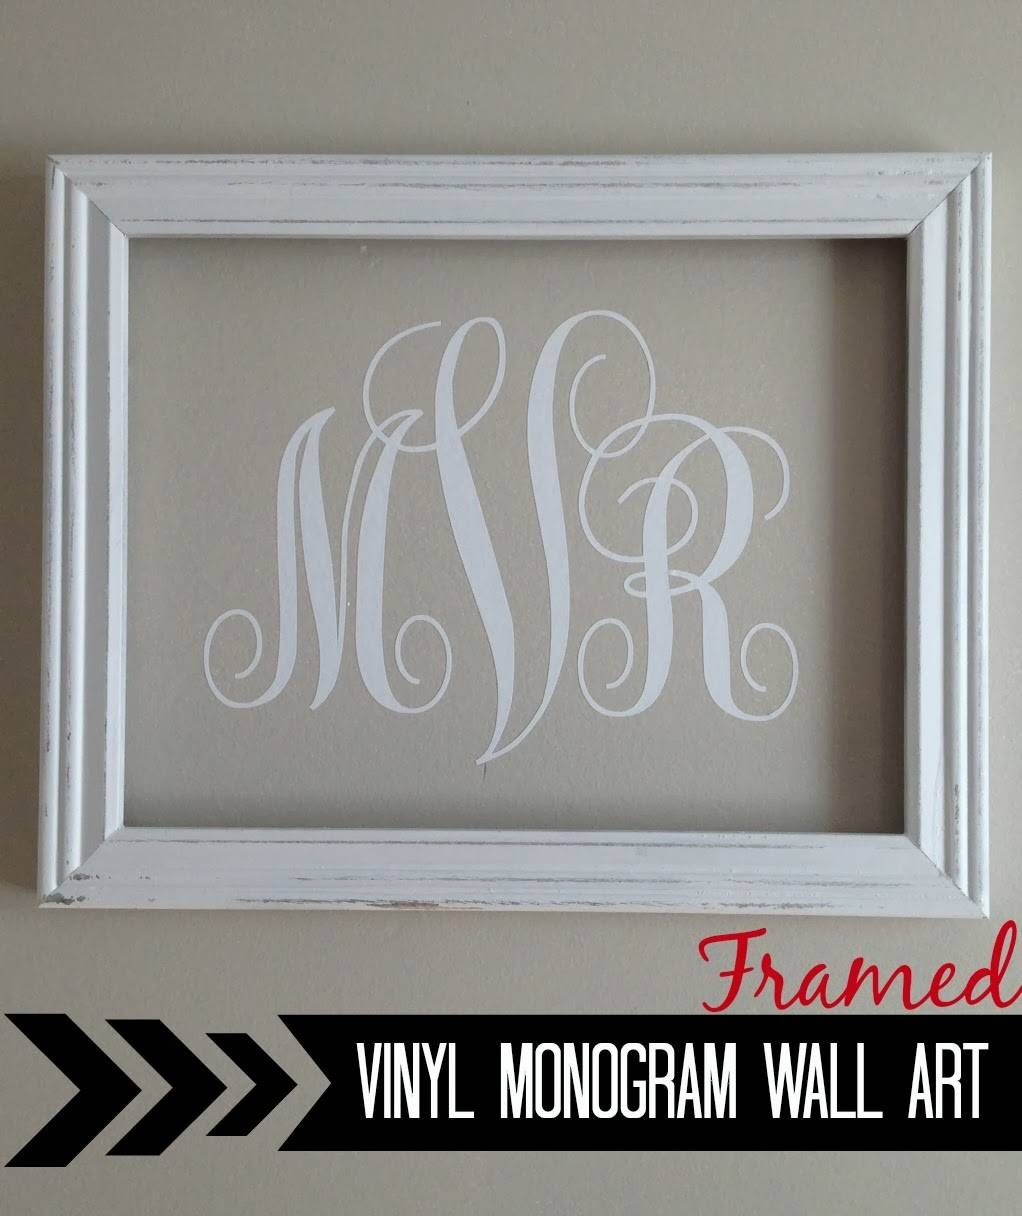 Wonderful Monogram Wall Art Groupon Image Of Monogram Wall For Recent Groupon Wall Art (View 19 of 20)